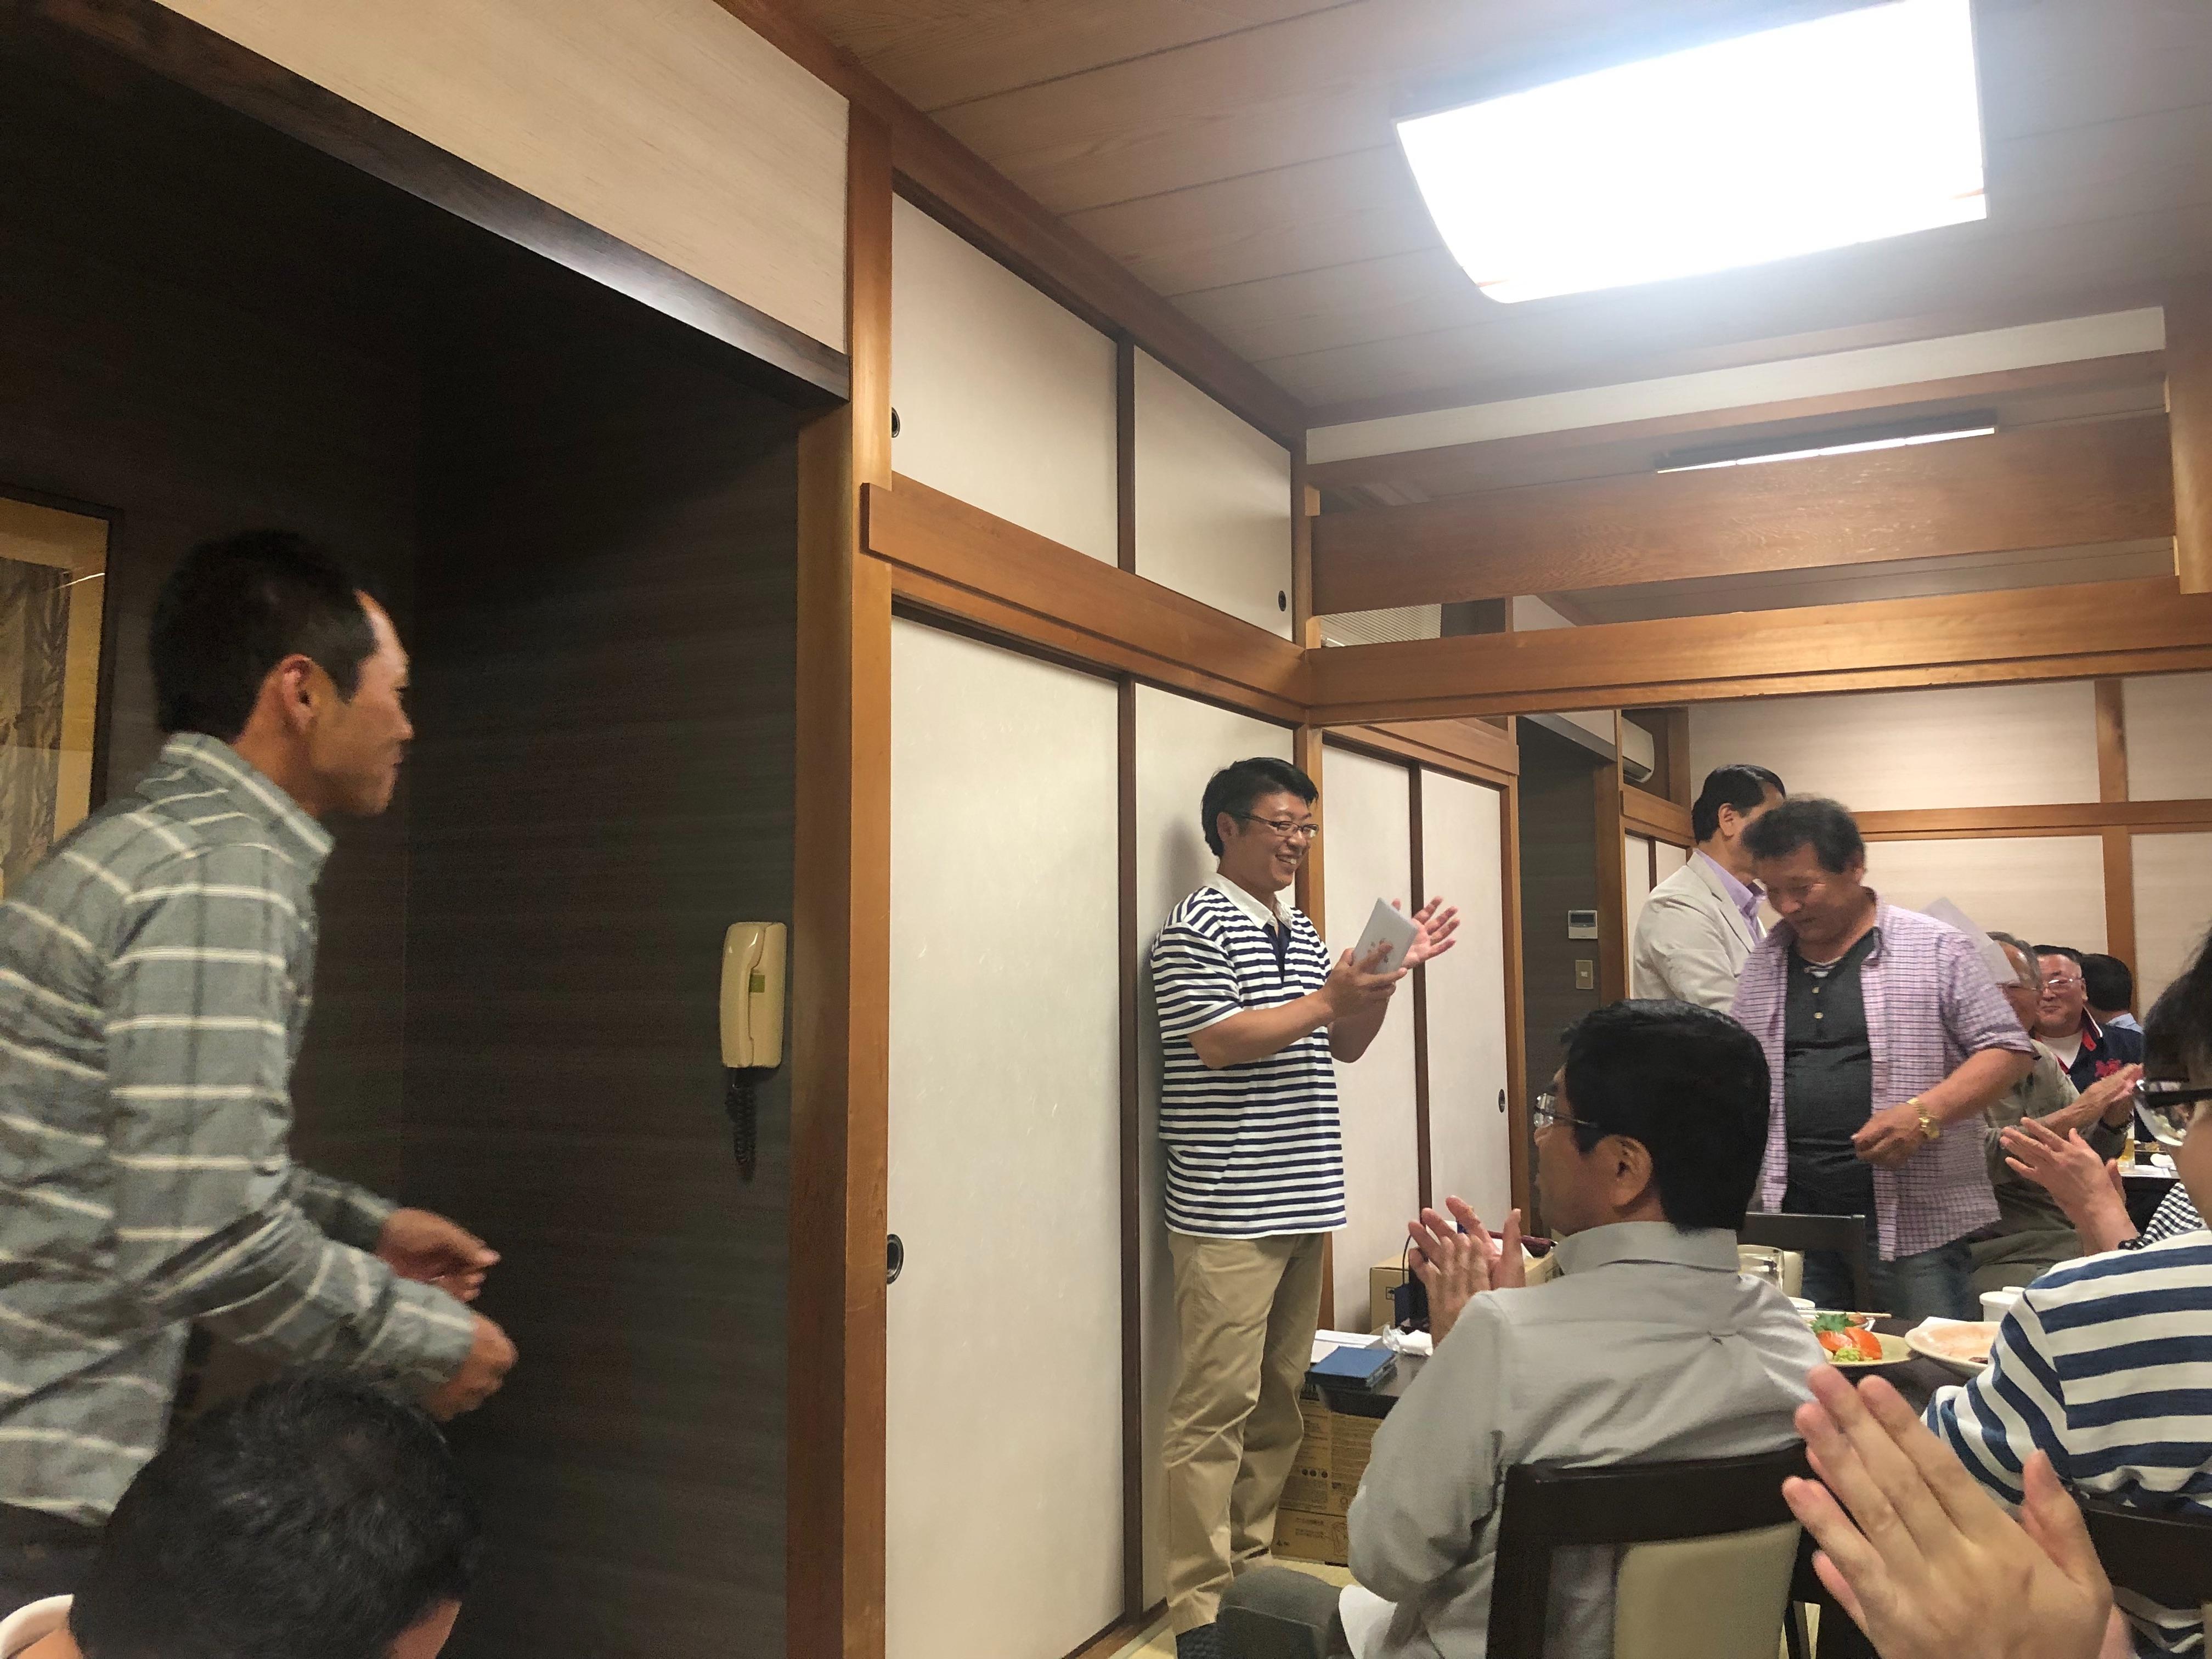 f:id:masanori-kato1972:20190519072428j:image